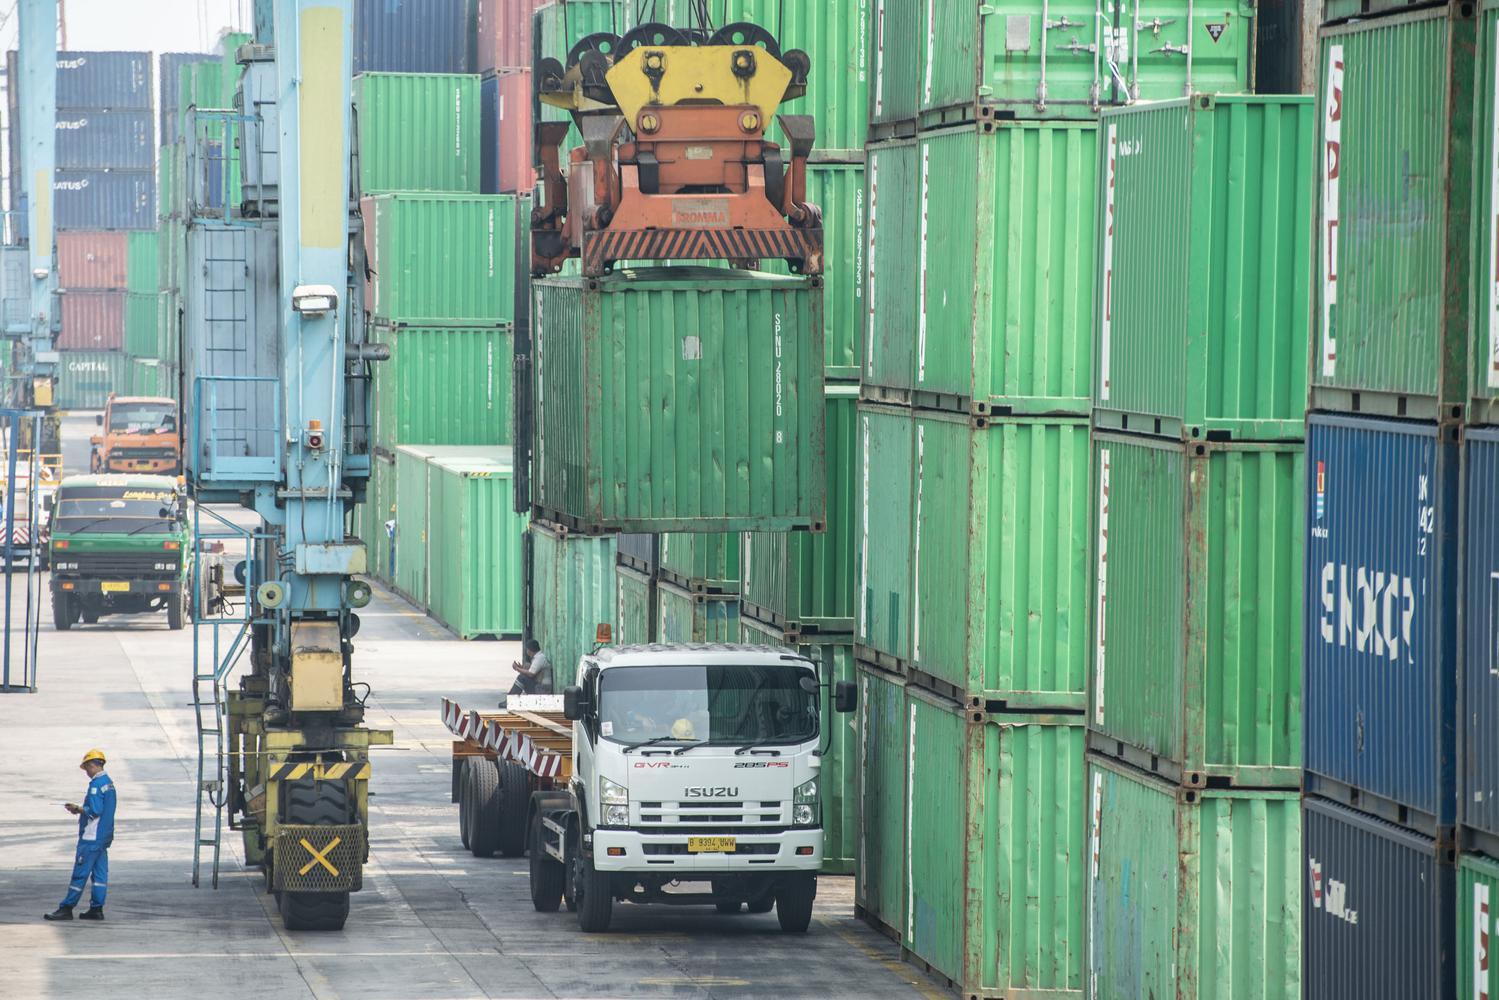 Pemerintah bakal menyelidiki lonjakan impor sirop fluktuosa asal Tiongkok, Filipina dan negara lain.